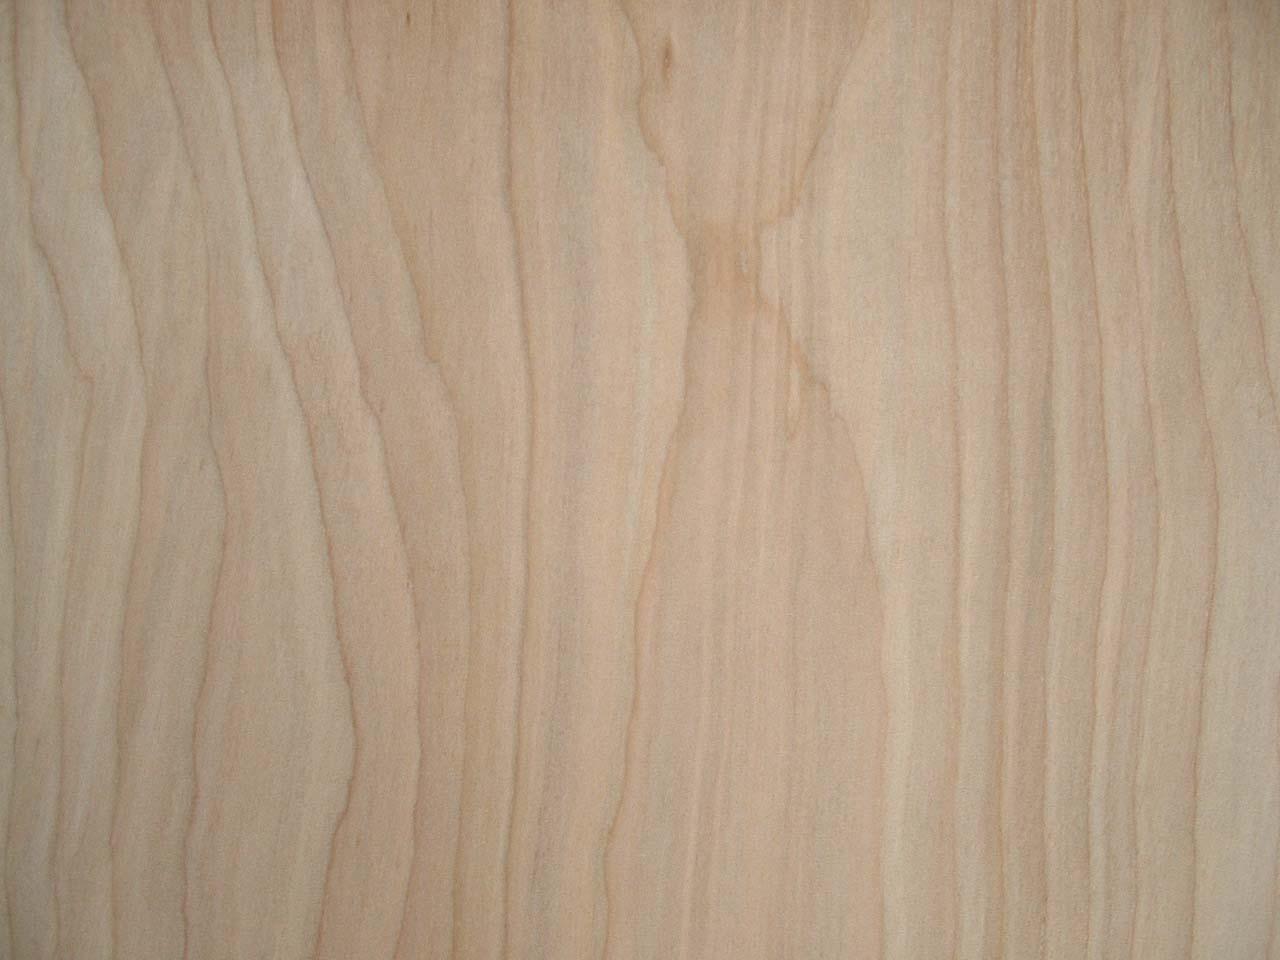 Appleply Plywood Near Me